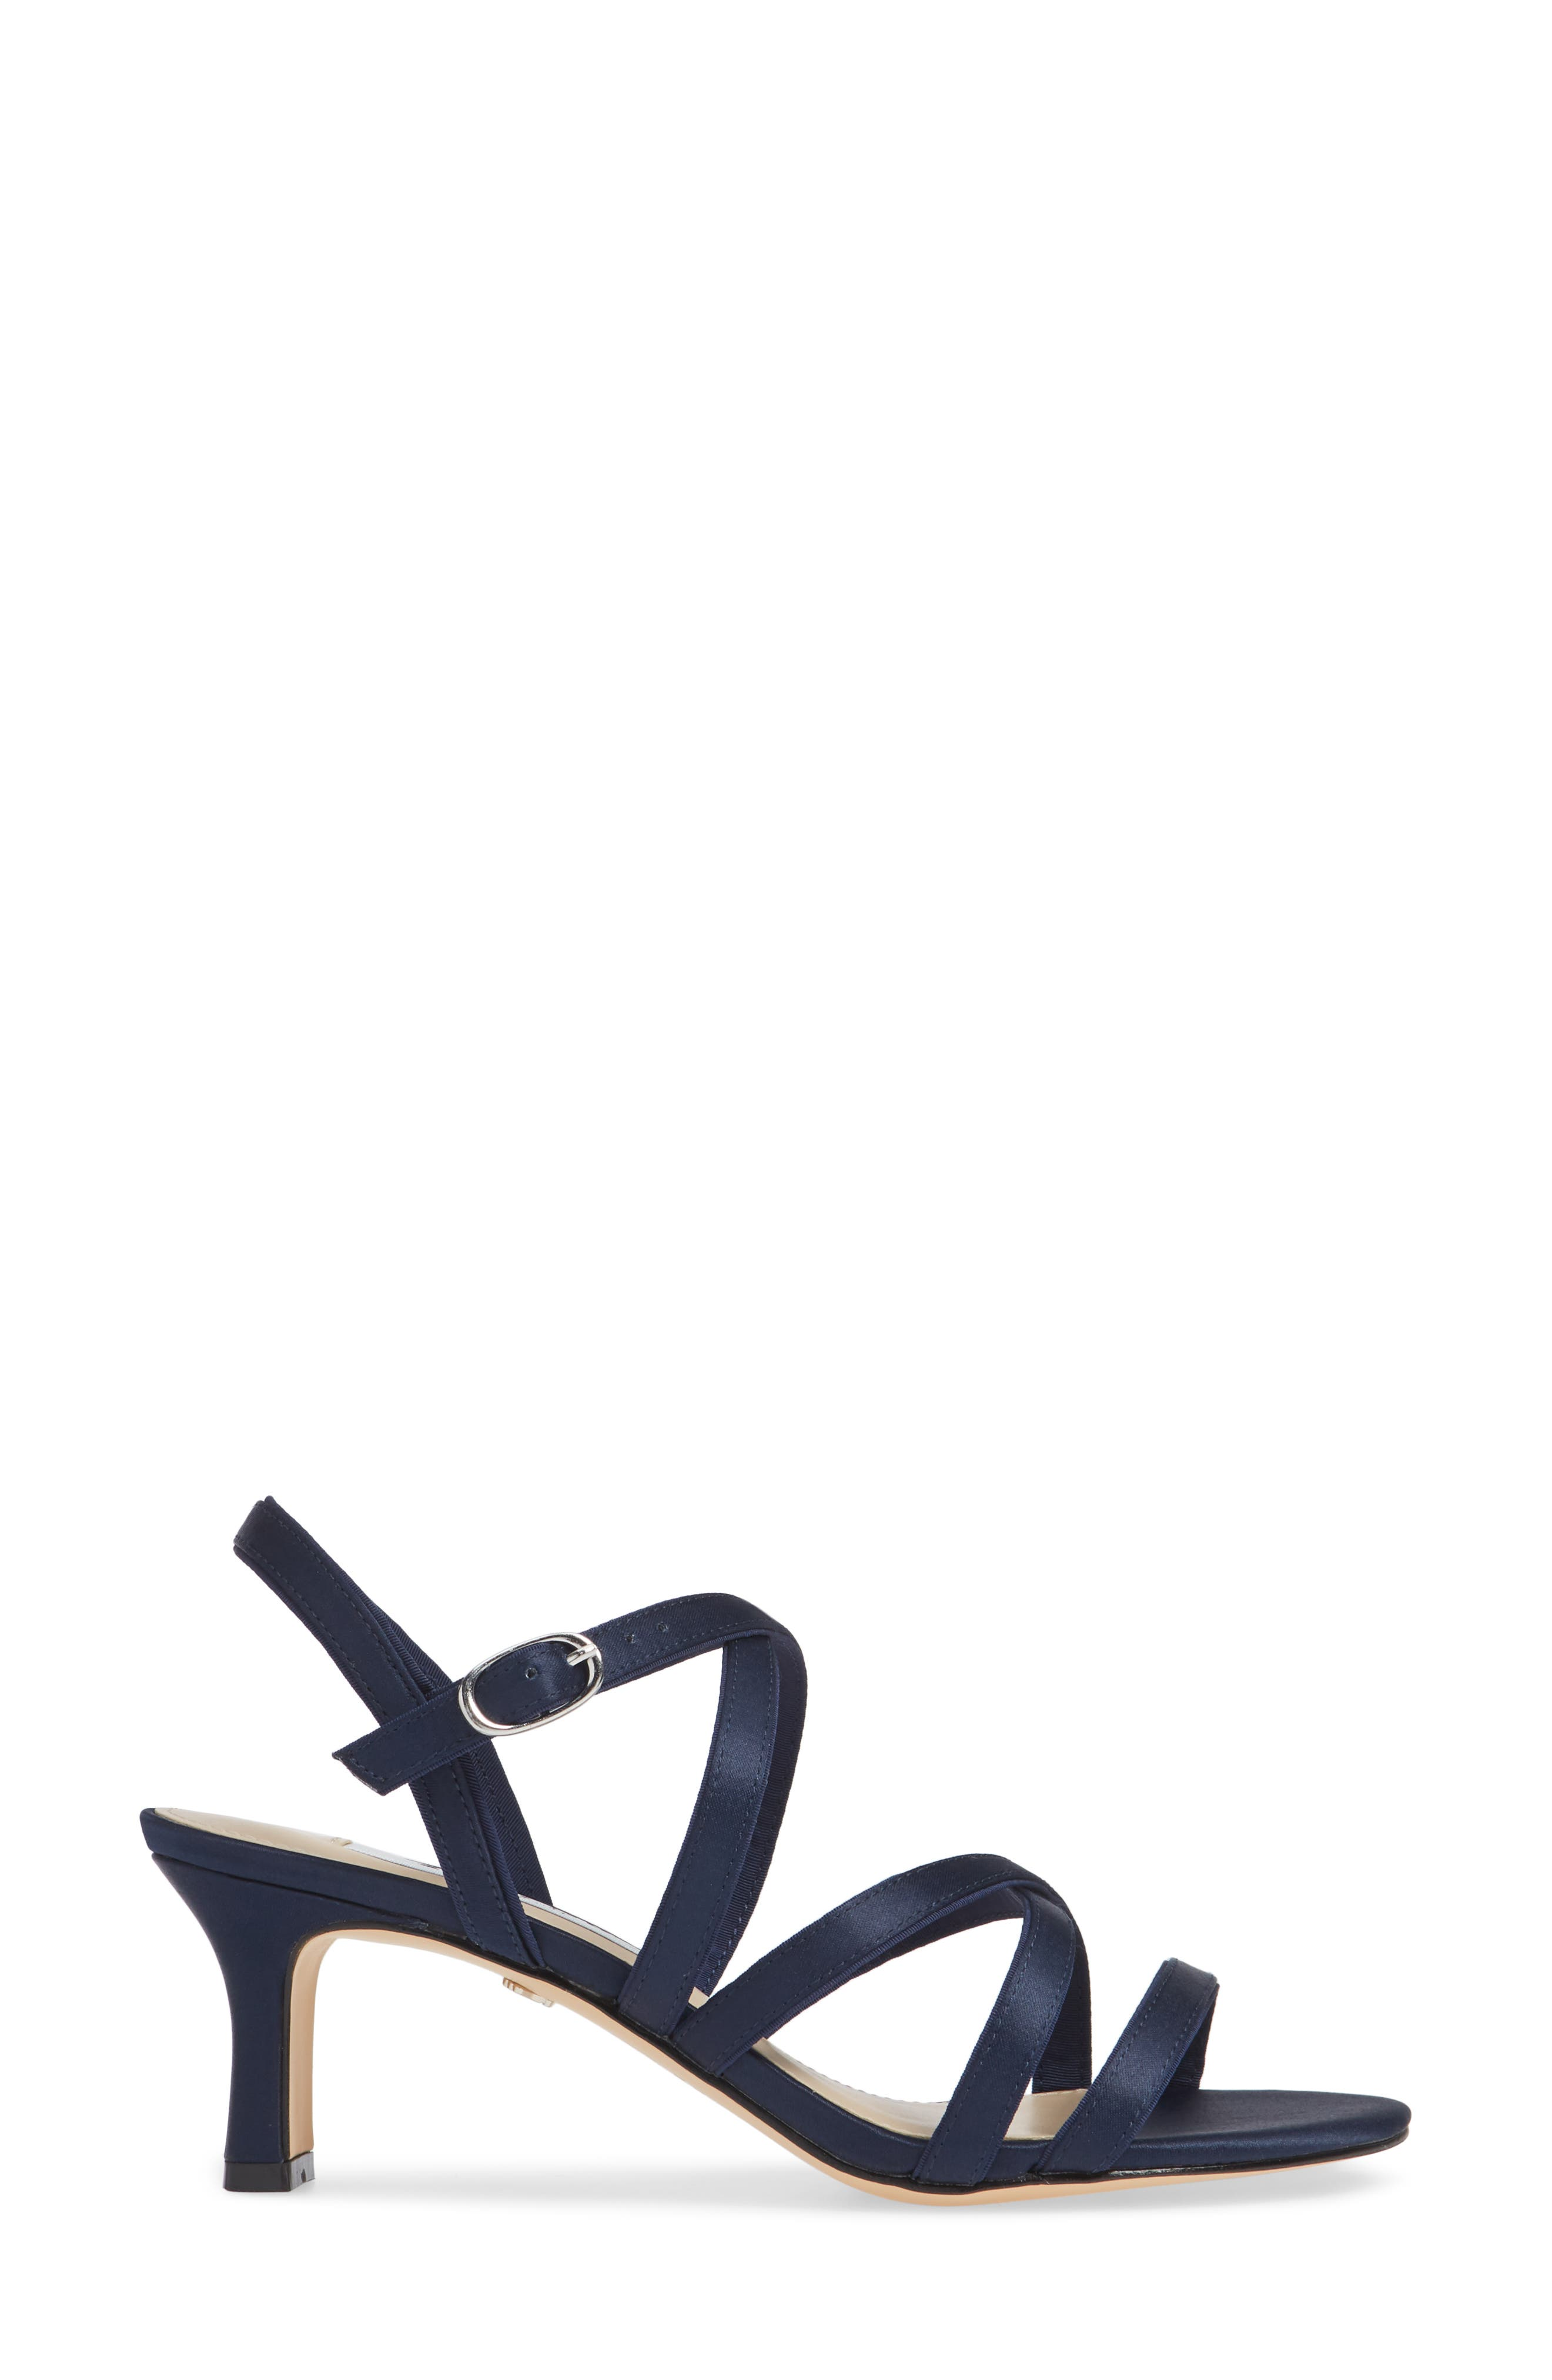 Genaya Strappy Evening Sandal,                             Alternate thumbnail 5, color,                             Navy Satin